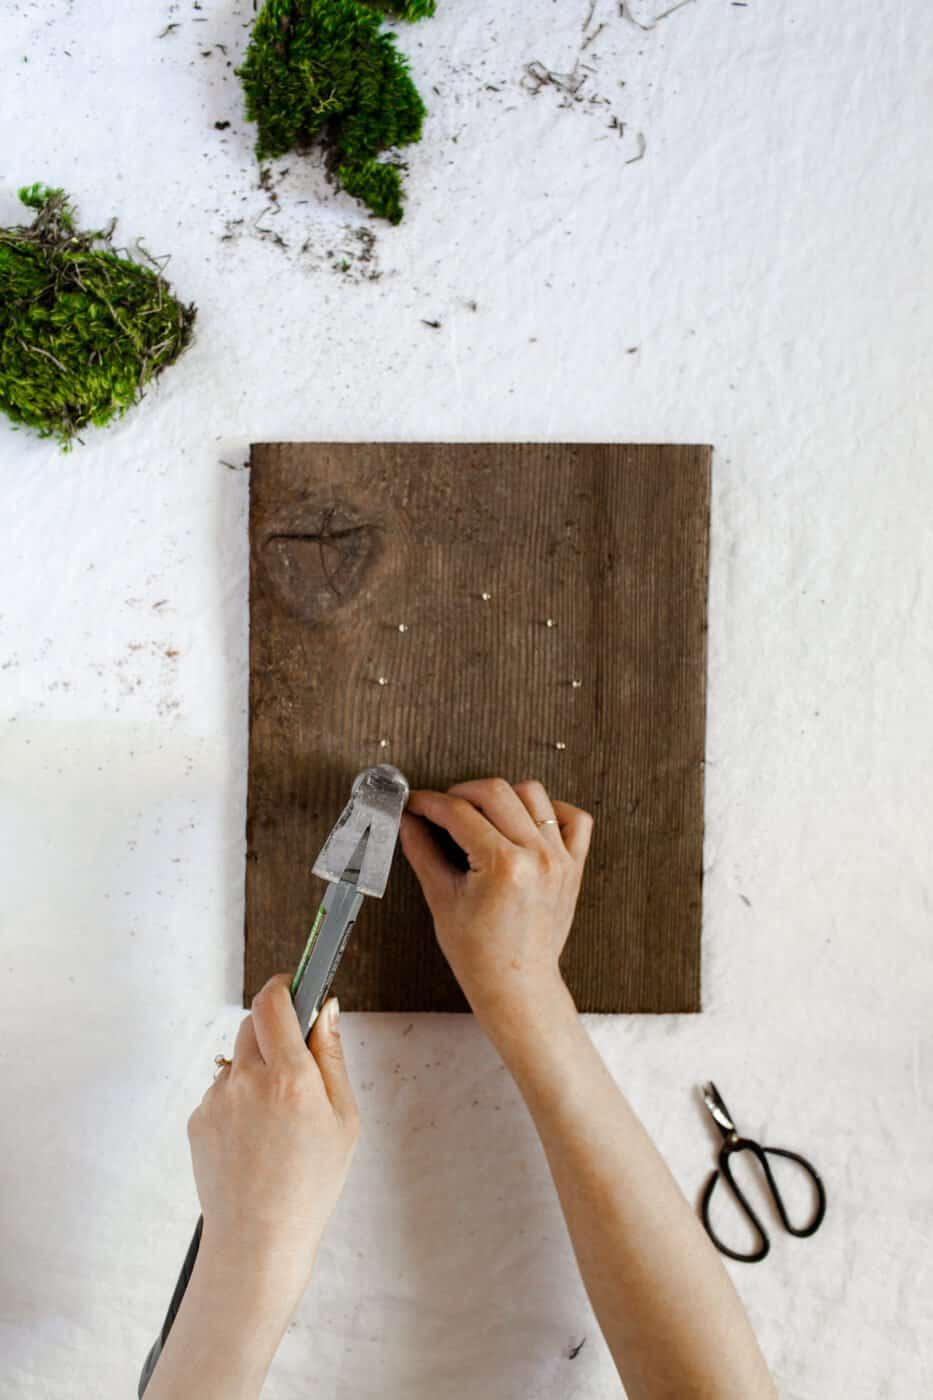 DIY-Wandpflanzen AKA Living Art